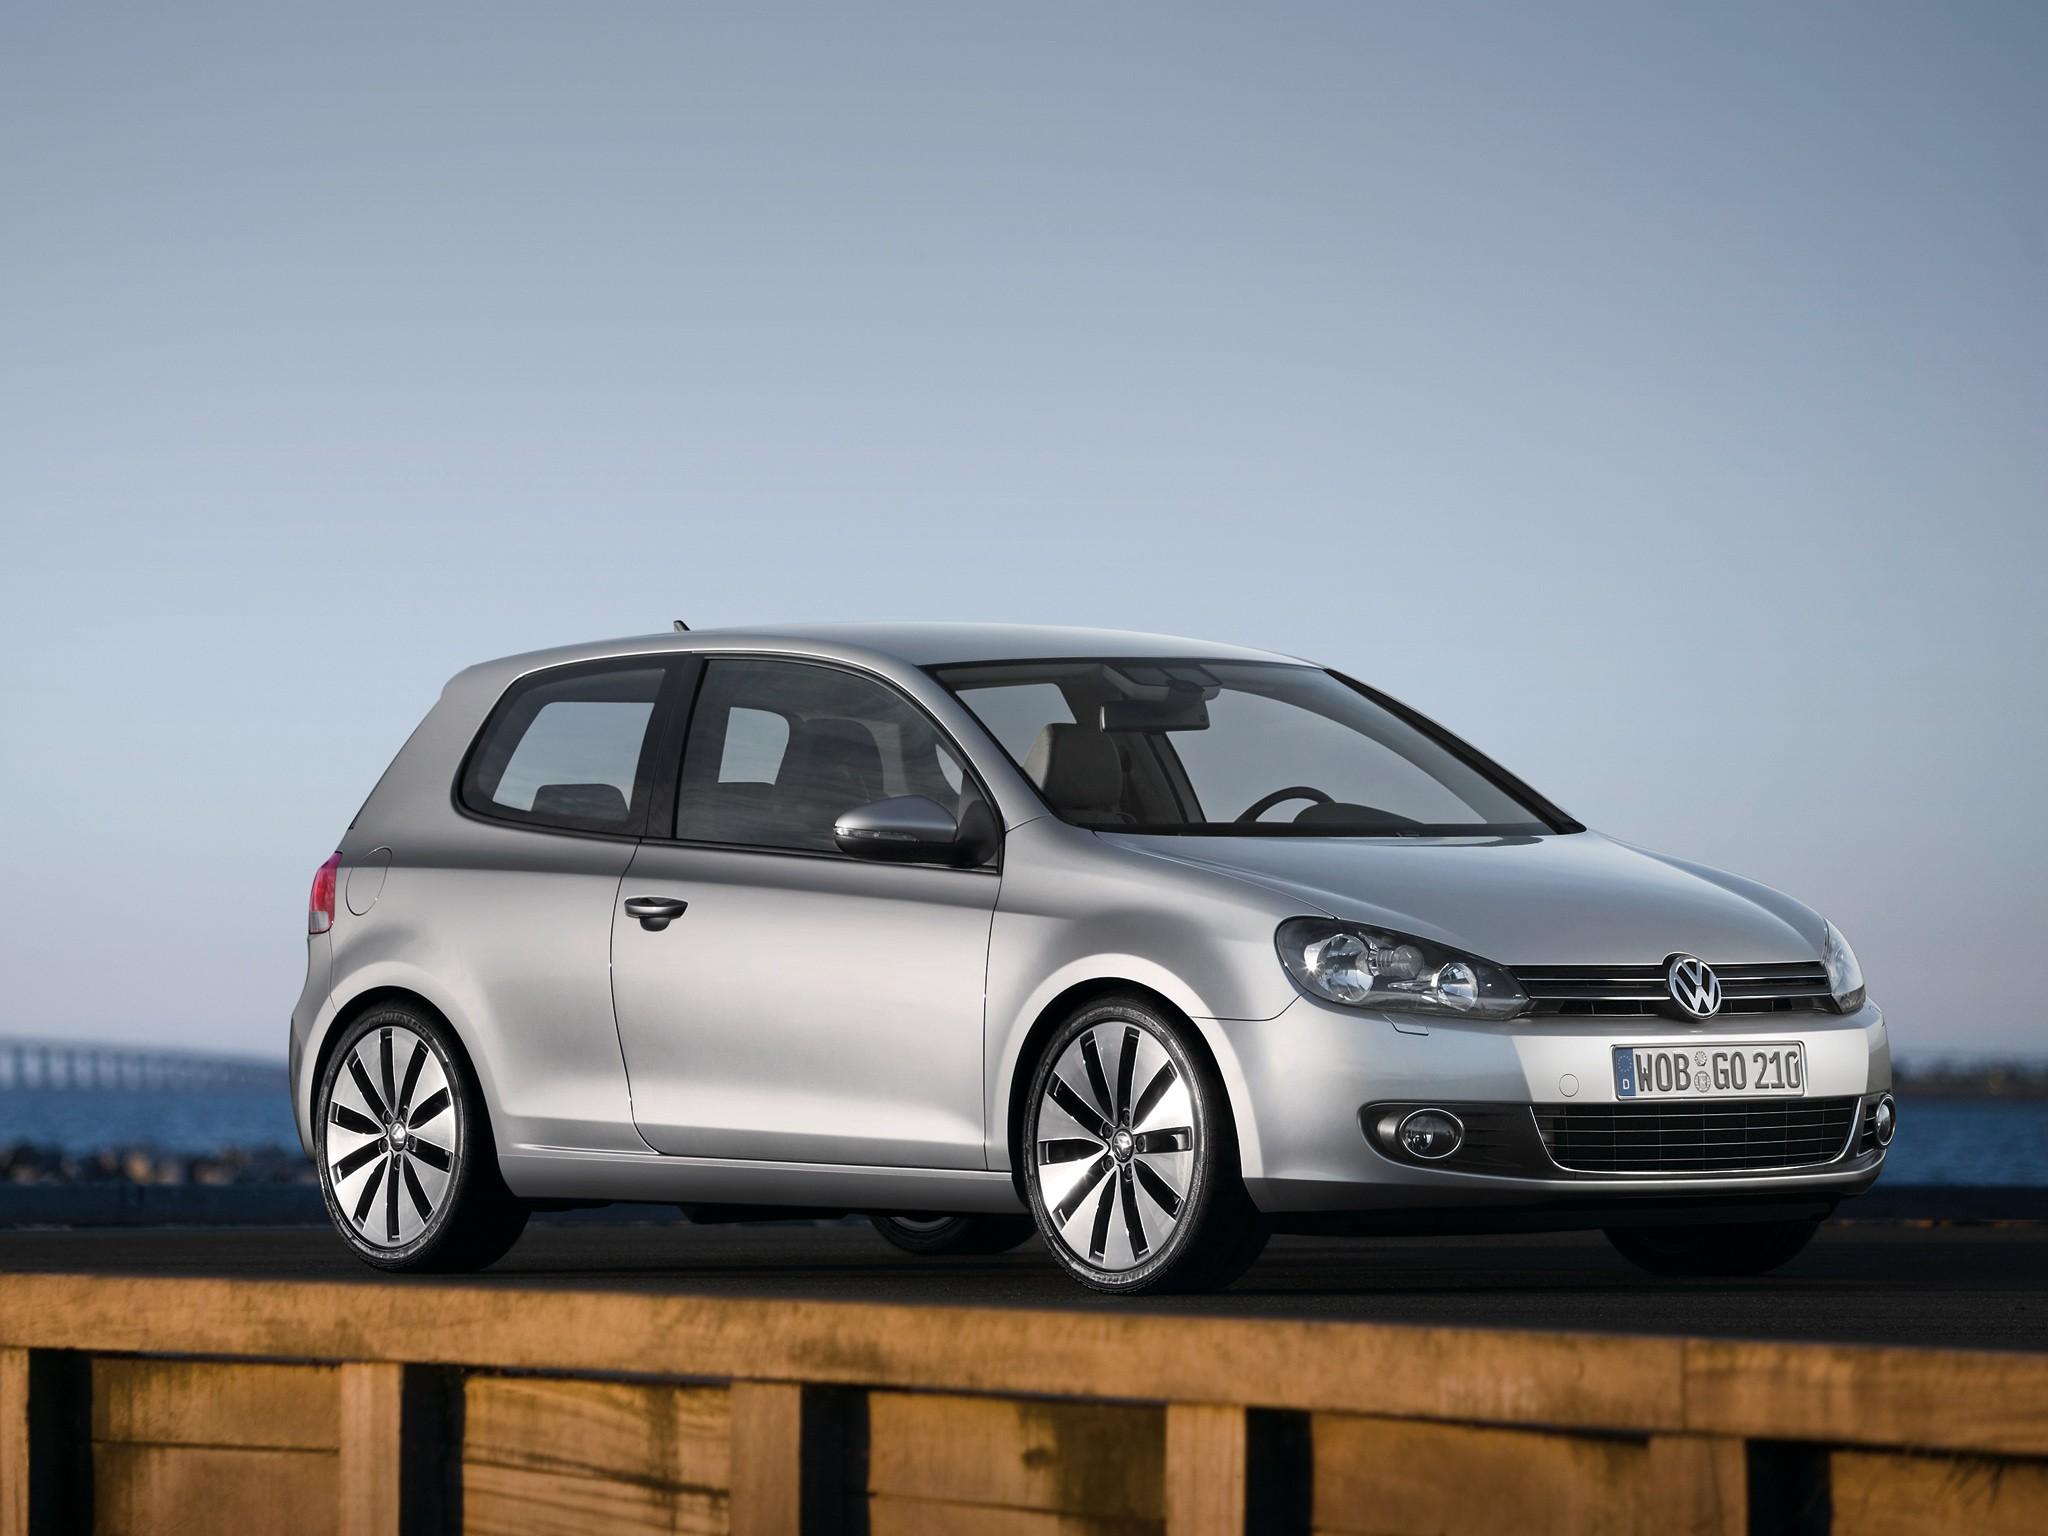 volkswagen golf vi 3 doors specs 2008 2009 2010 2011 2012 autoevolution. Black Bedroom Furniture Sets. Home Design Ideas